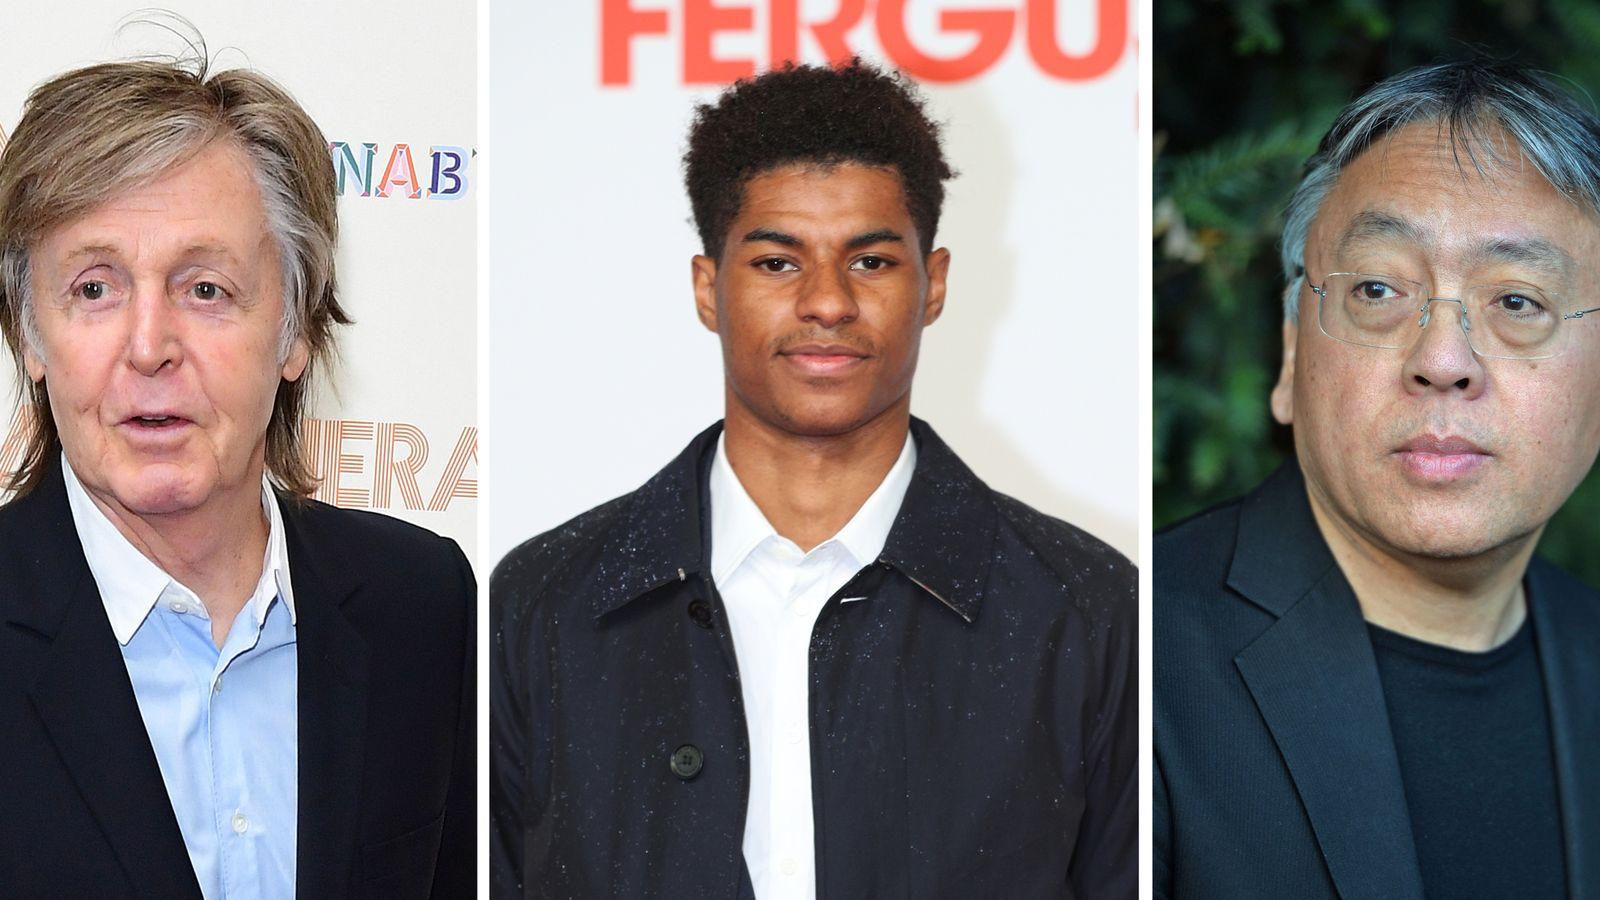 McCartney, Rashford and Ishiguro shortlisted for Book of the Year award